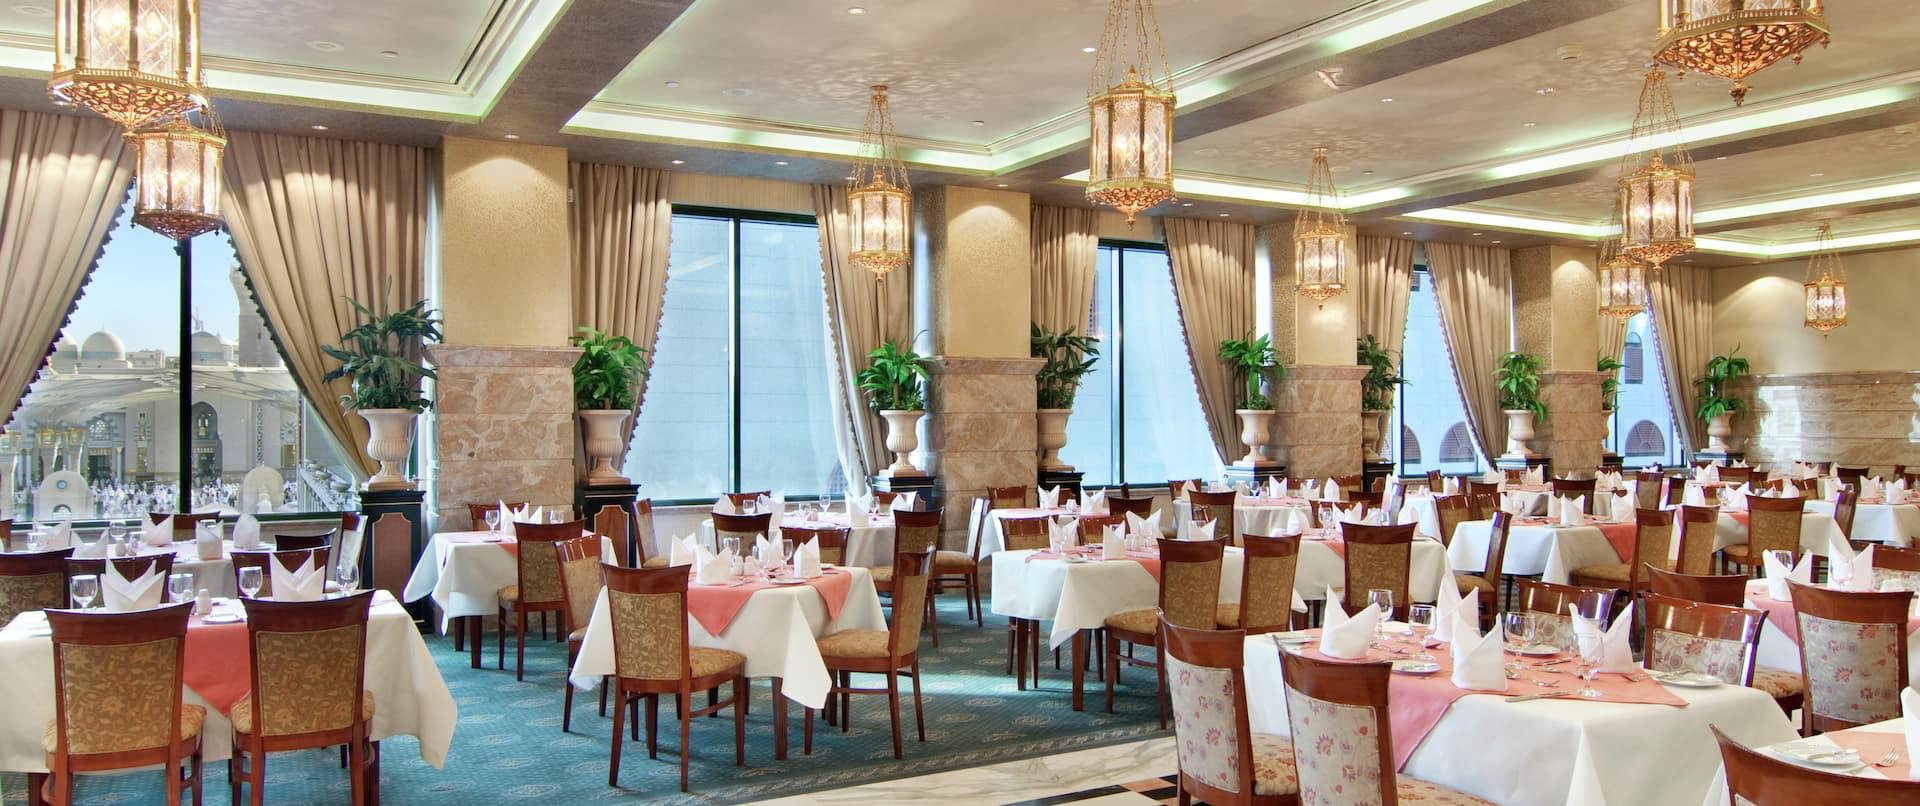 Madinah Restaurant